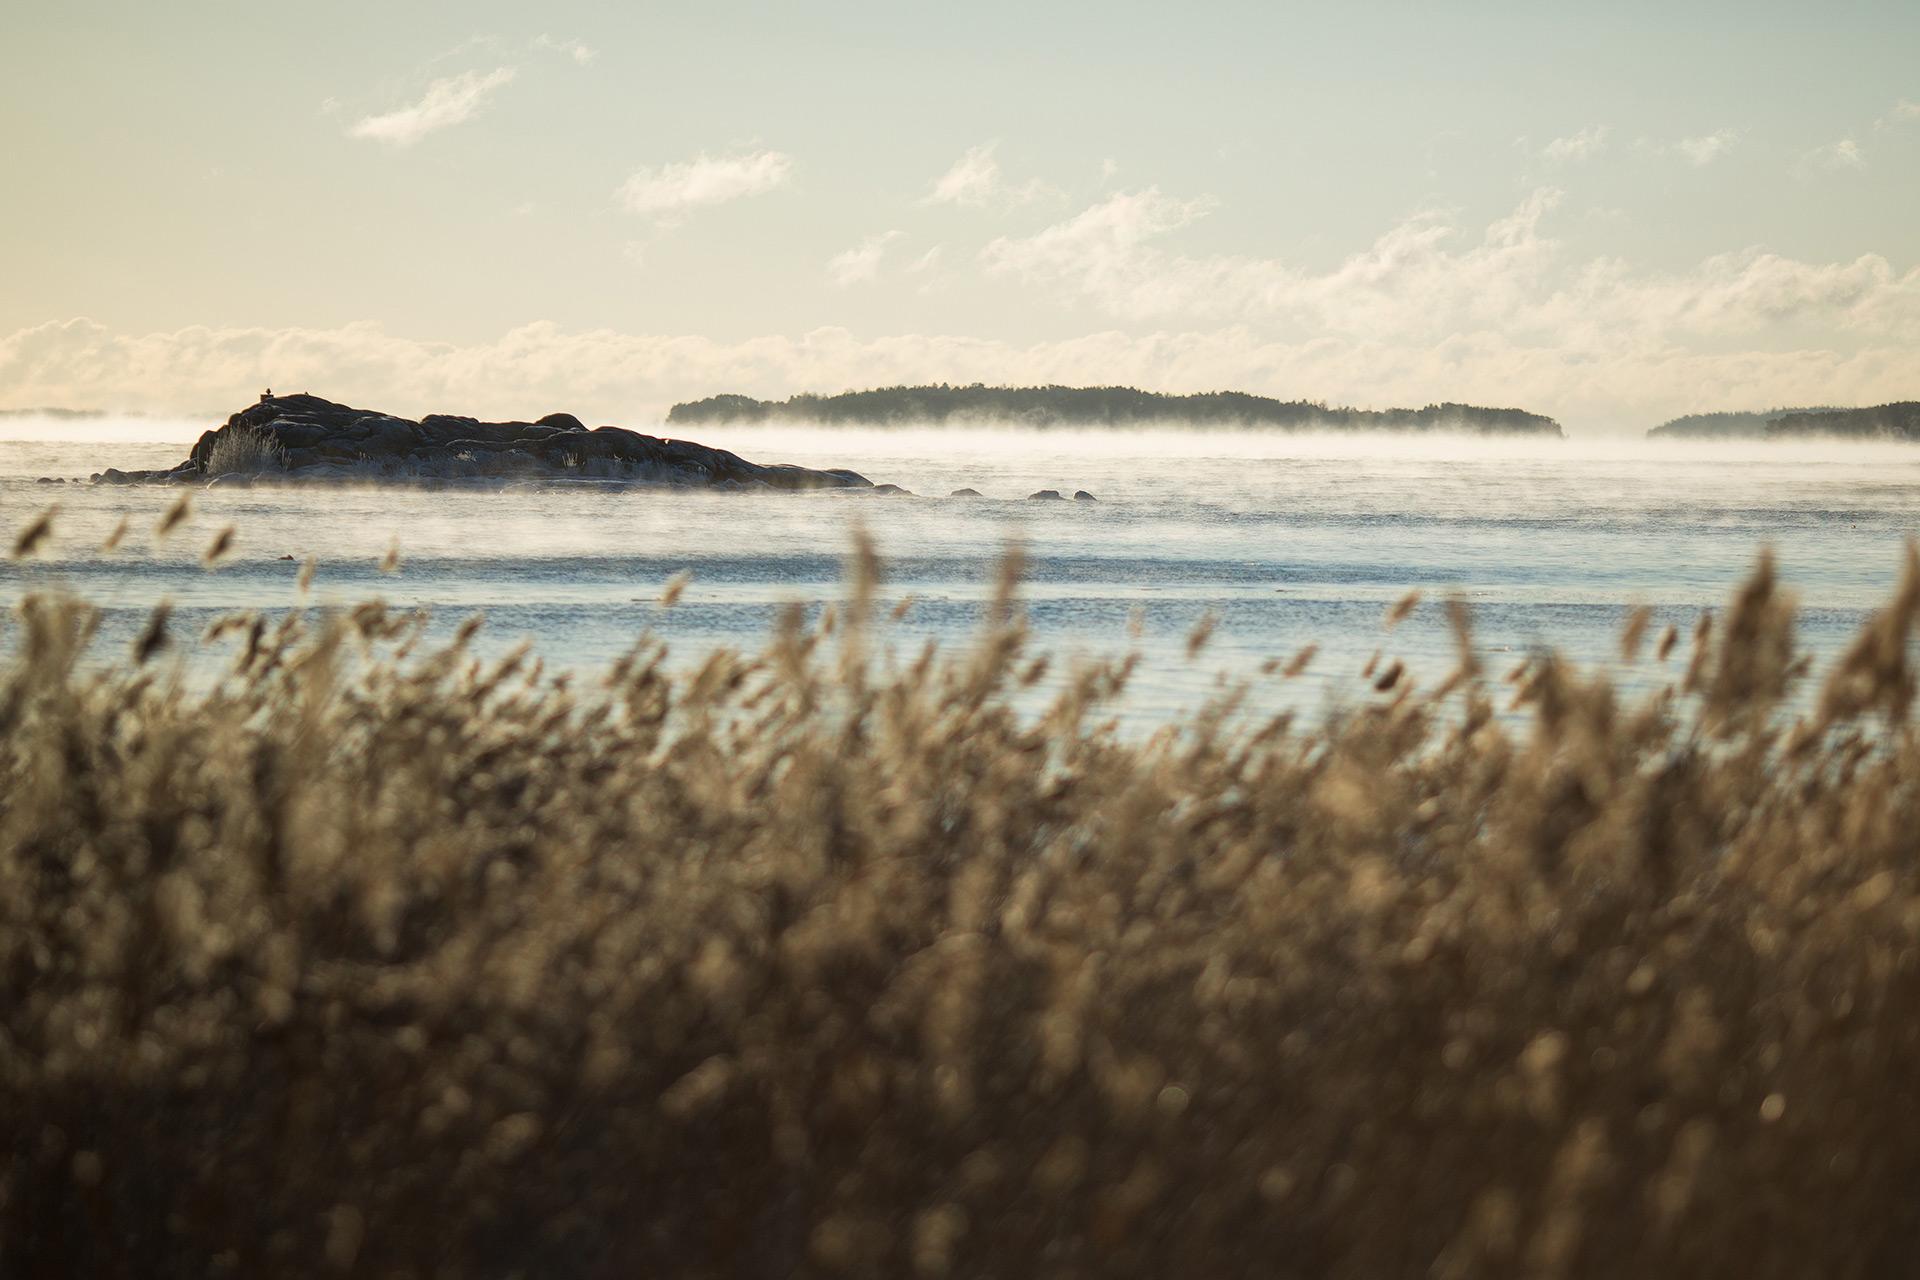 Bird islets abandoned / Photo: A. Kuusela